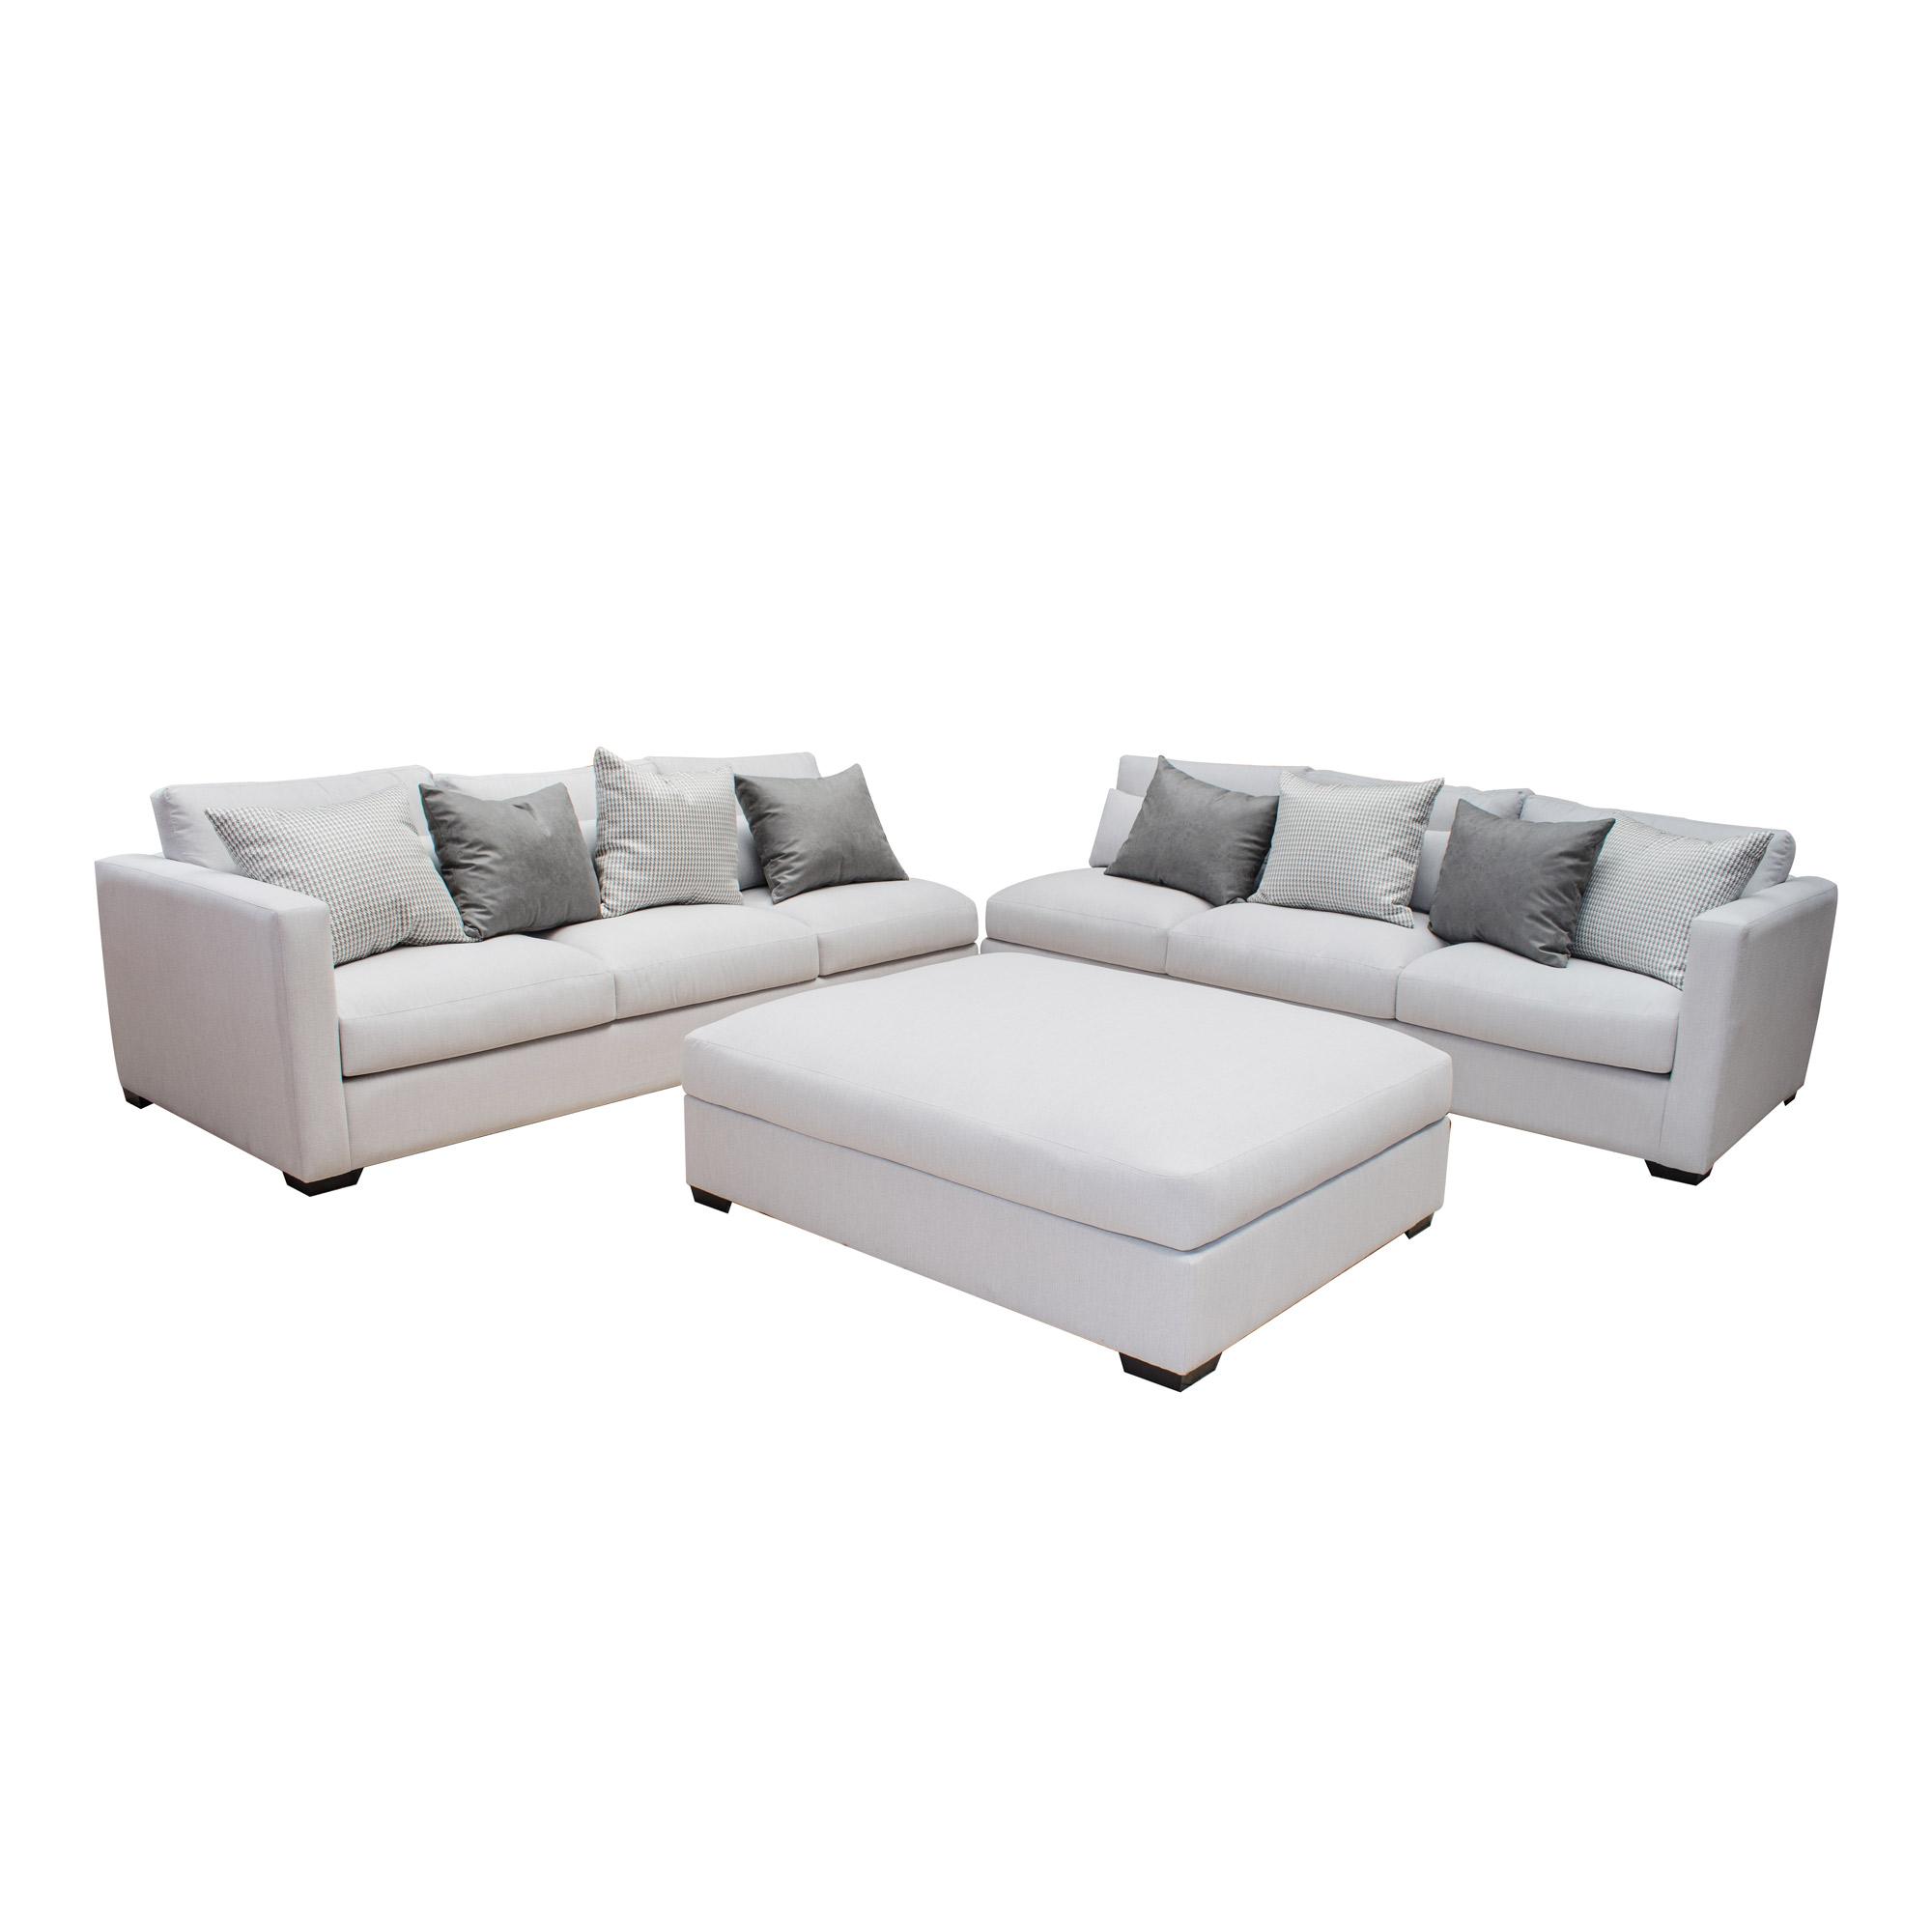 sofa-dante-izquierdo-3